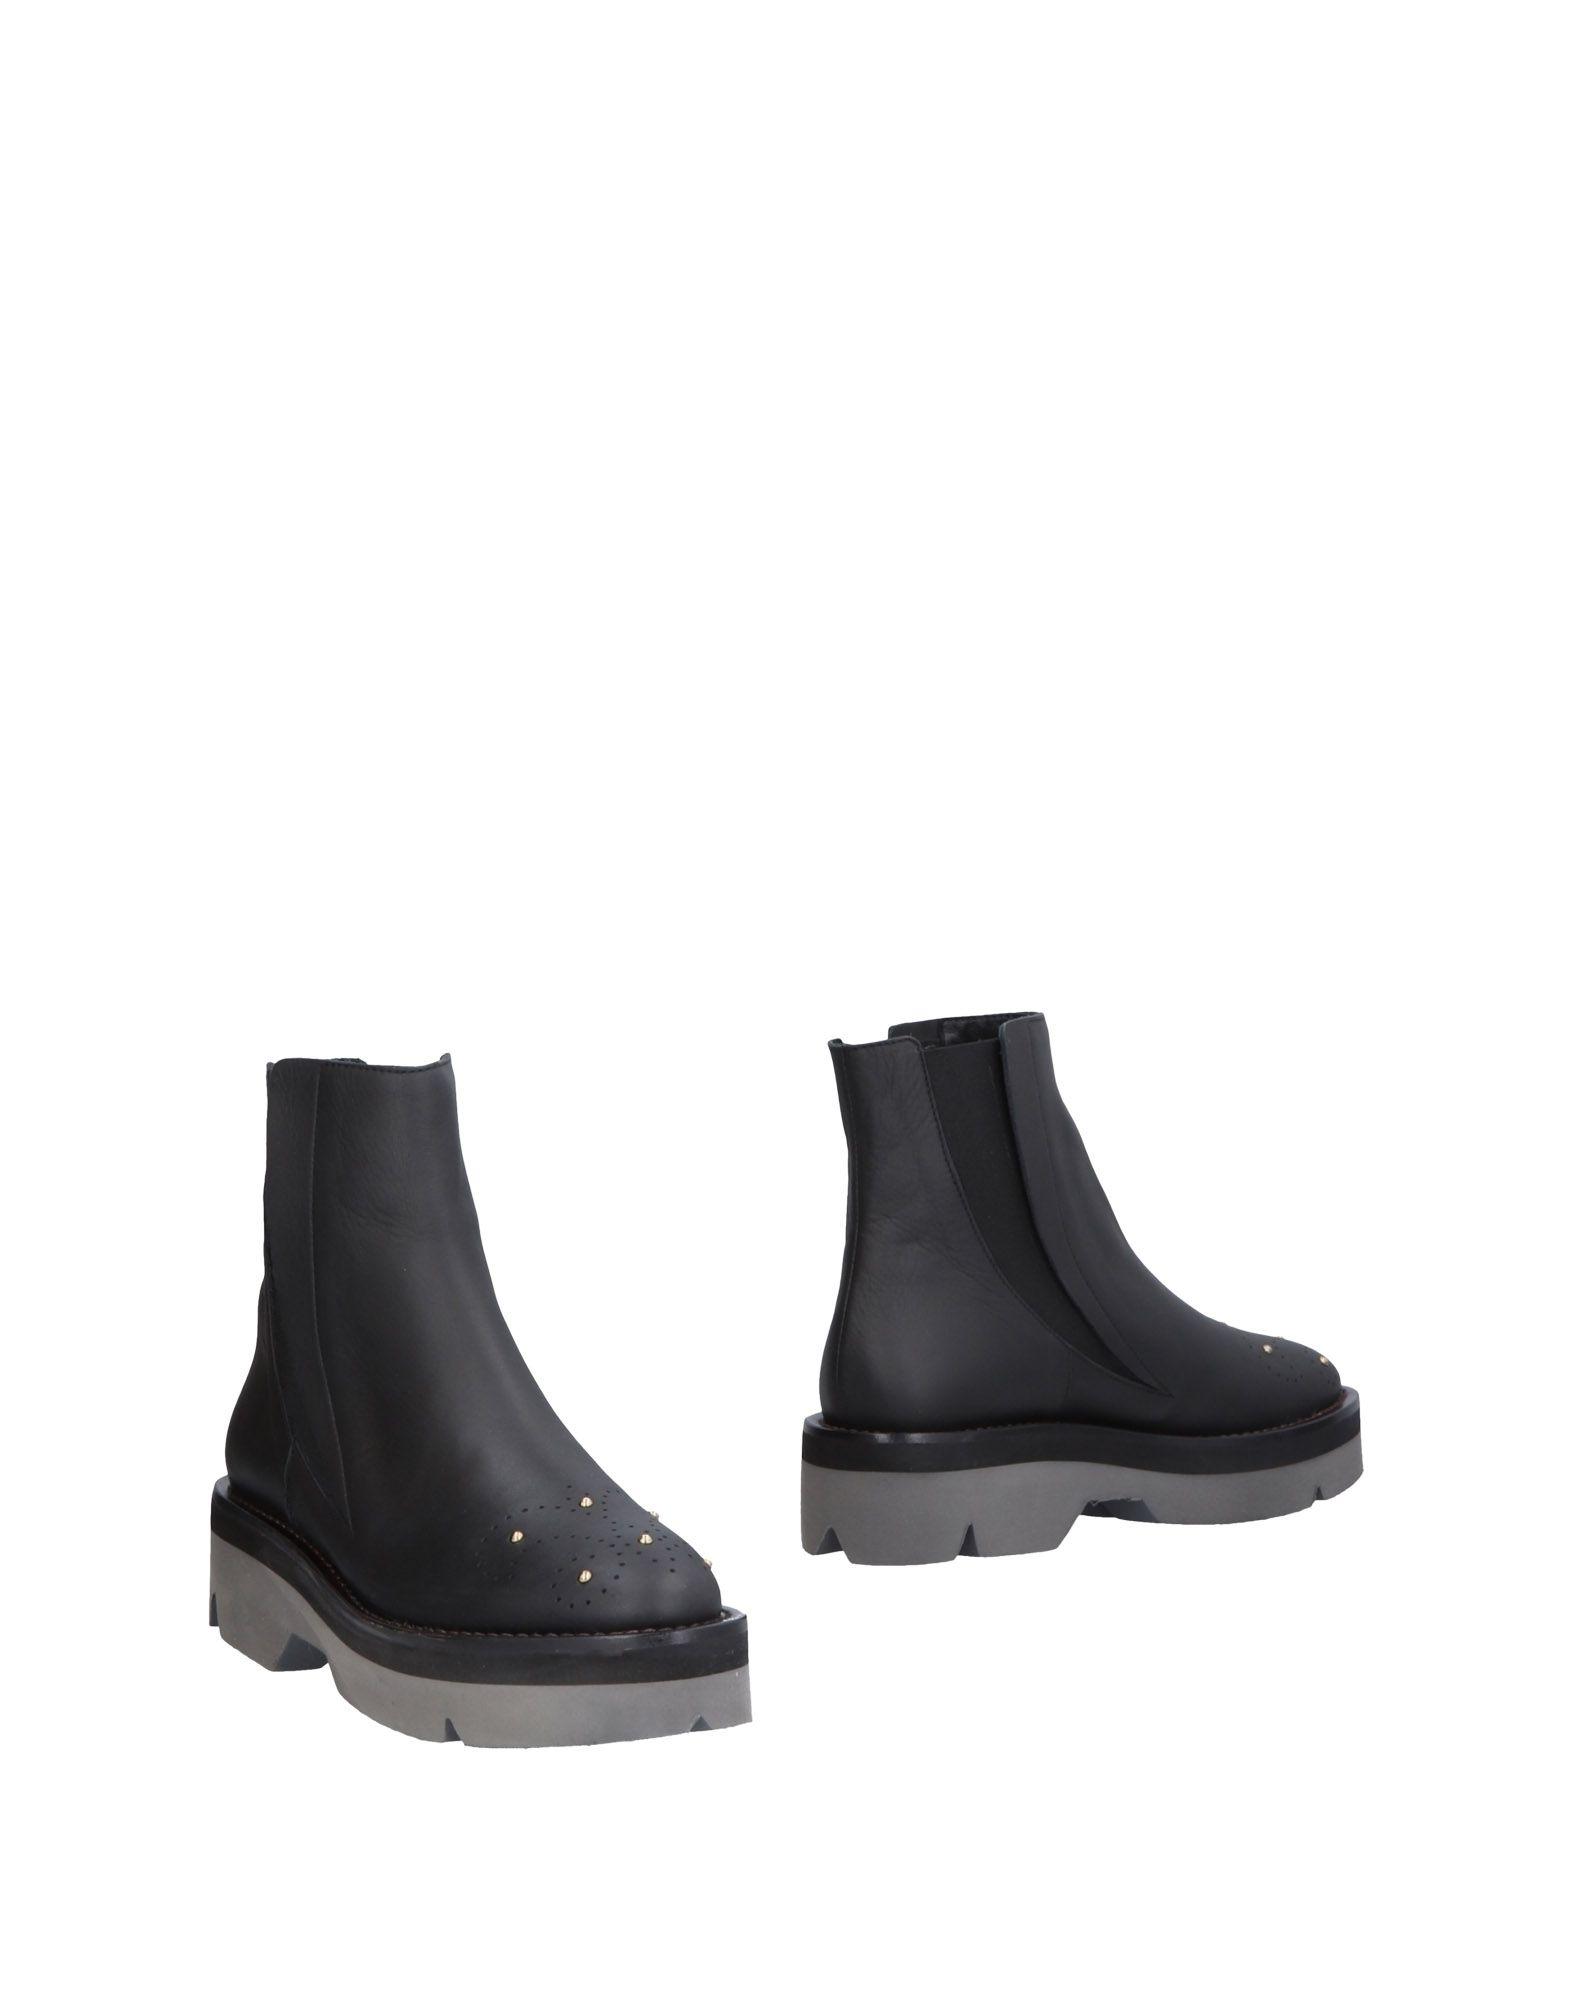 GIORGIO FABIANI Полусапоги и высокие ботинки pr ro18 статуэтка бронзовый век огюст роден museum parastone